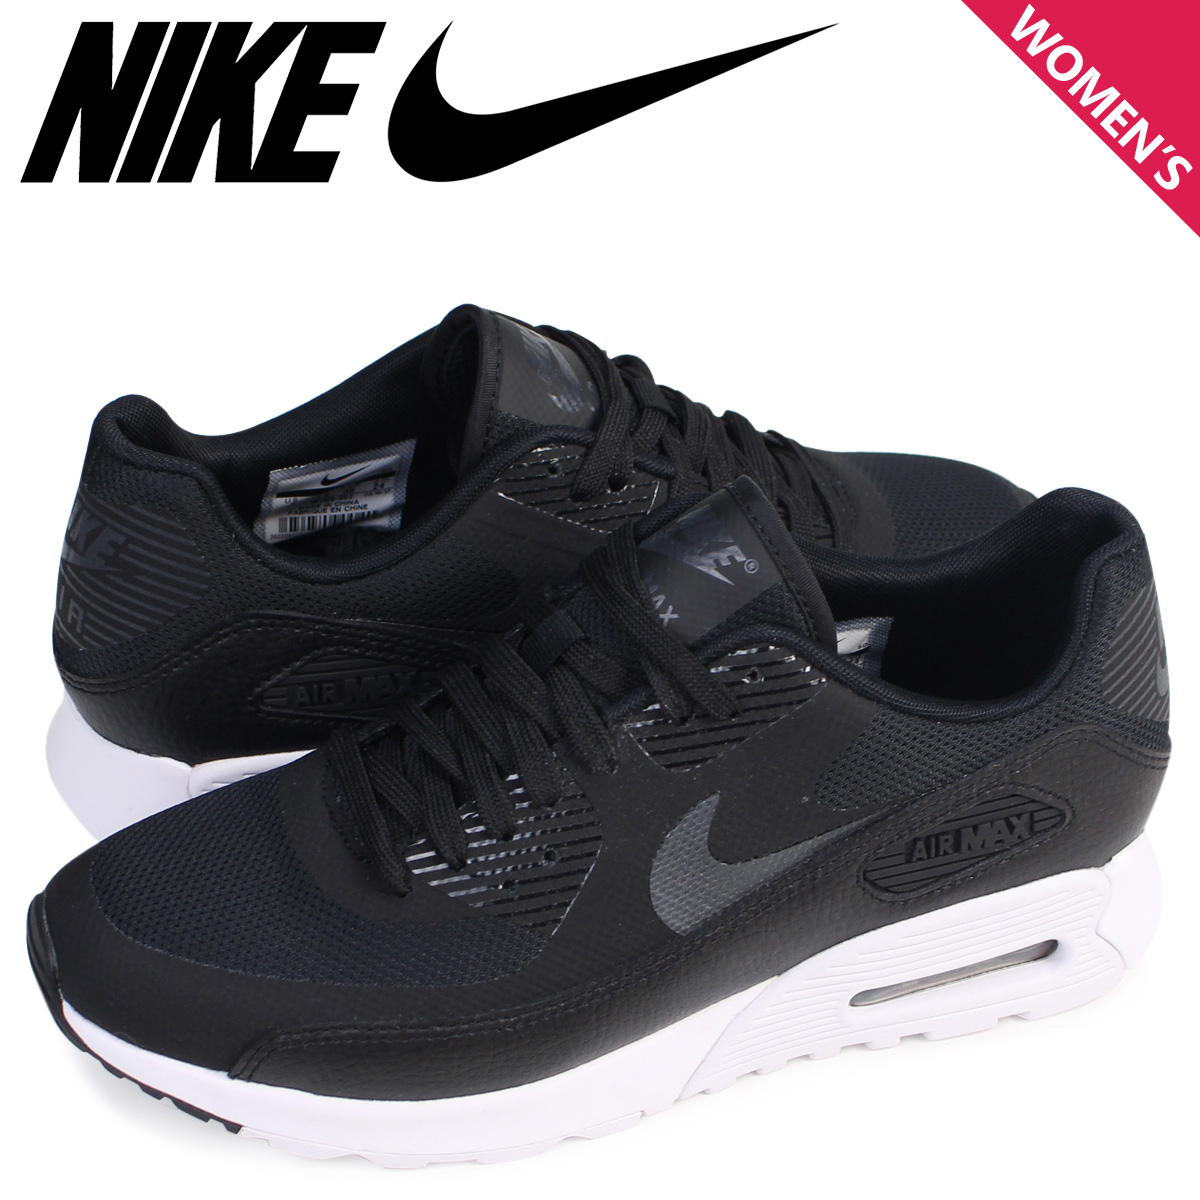 sports shoes f16dc 7c056 Nike NIKE Air Max 90 ultra Lady s sneakers WMNS AIR MAX 90 ULTRA 2.0 881,106 -002 shoes black  8 9 Shinnyu load